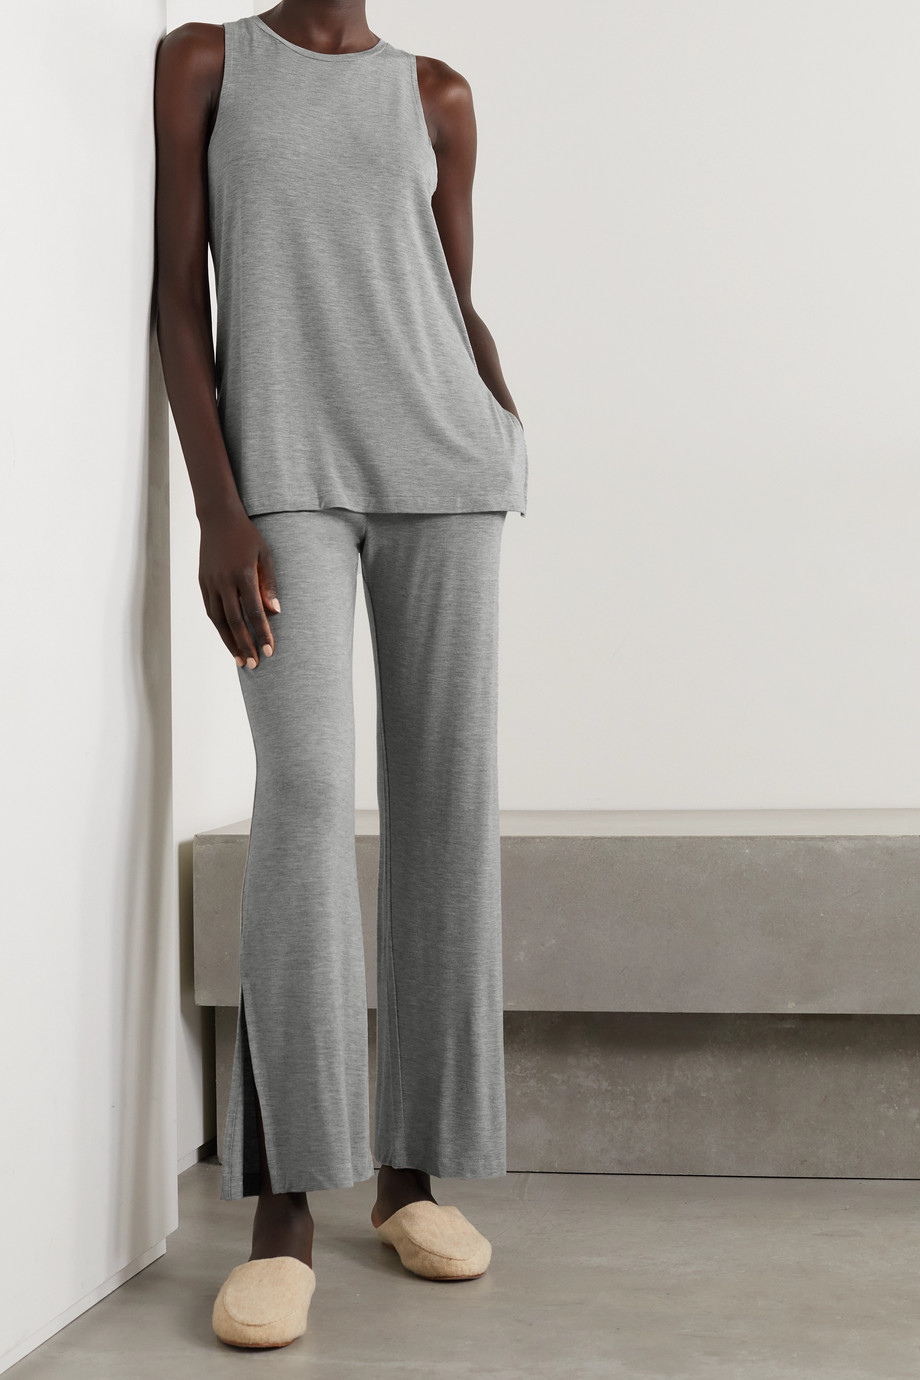 Skin Lumi Pyjama-Hose aus meliertem Stretch-Jersey